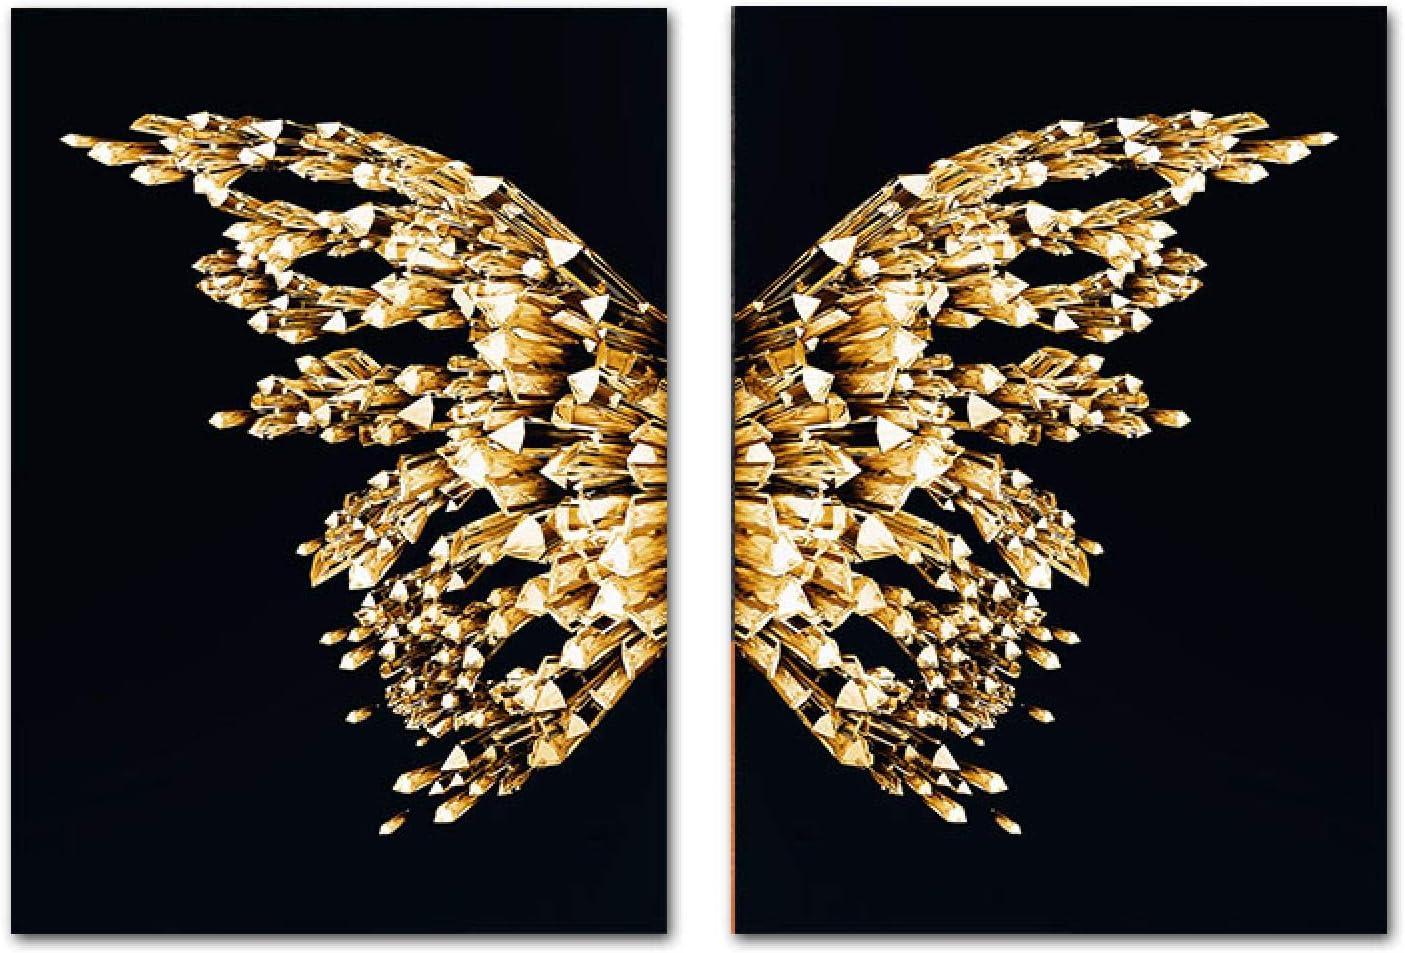 "YQLKC Golden Butterfly Geometric Decor Painting Canvas Minimalist Wall Art Print Modern Fashion Living Room Poster 23.6""x31.4""(60x80cm) x2 Frameless"